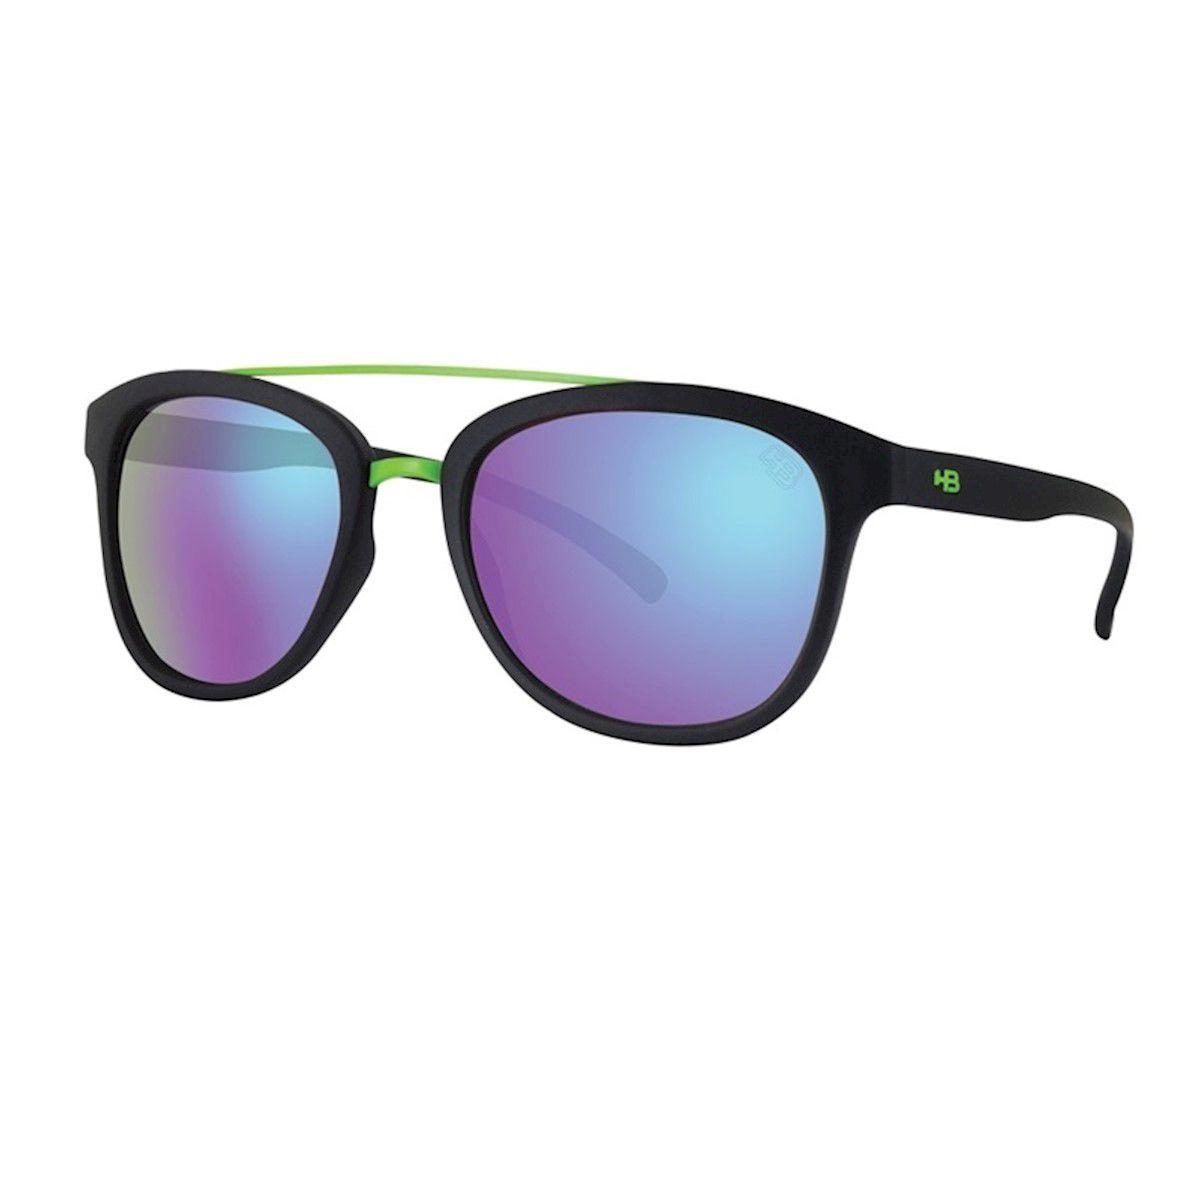 Óculos de Sol HB Moomba Matte Black